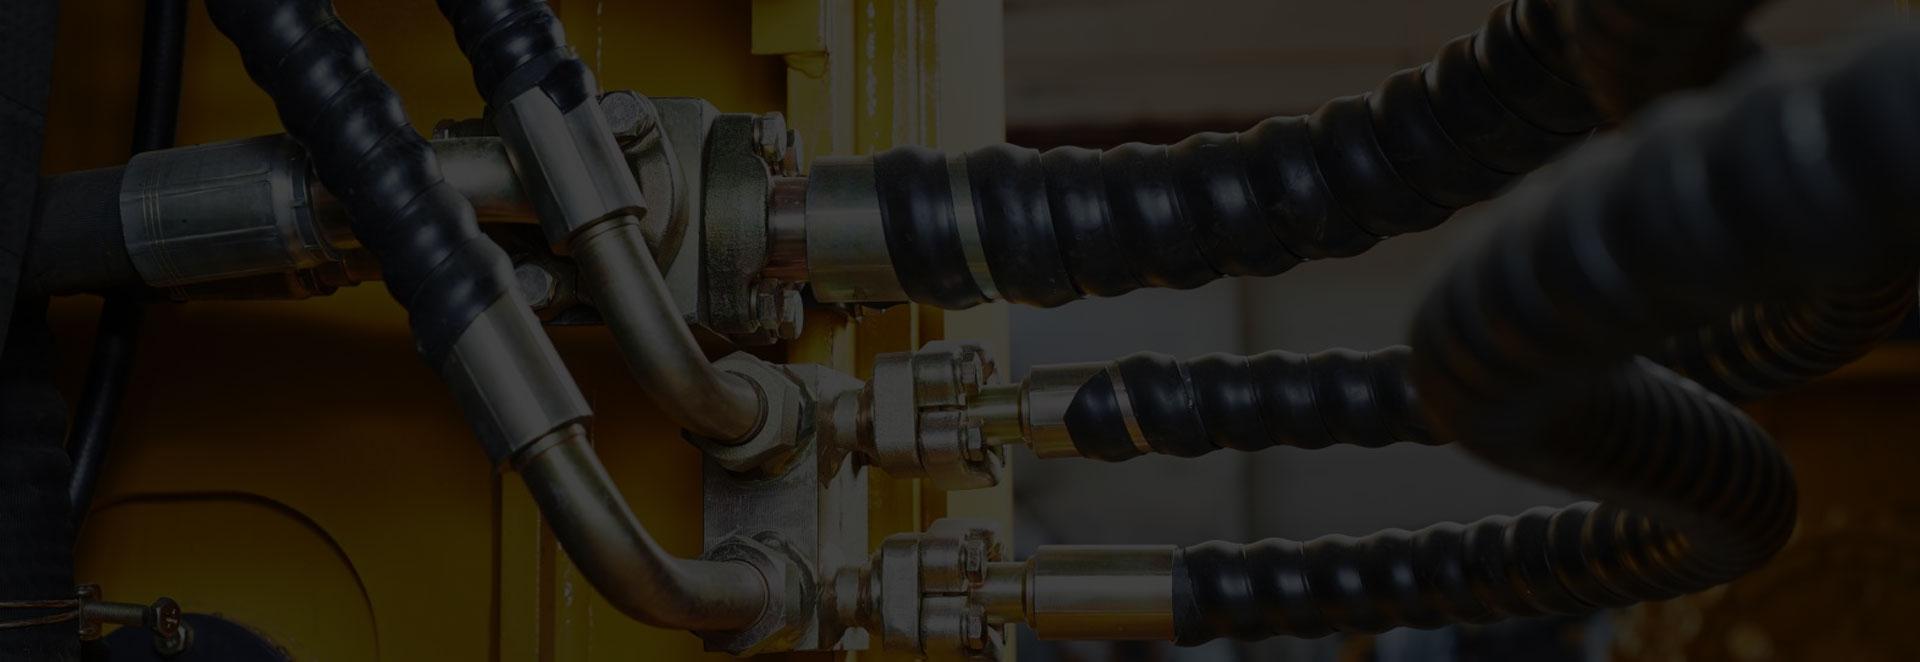 Ressourcing hydraulique, prestation FCI formation hydraulique - daniel Debat formateur expert